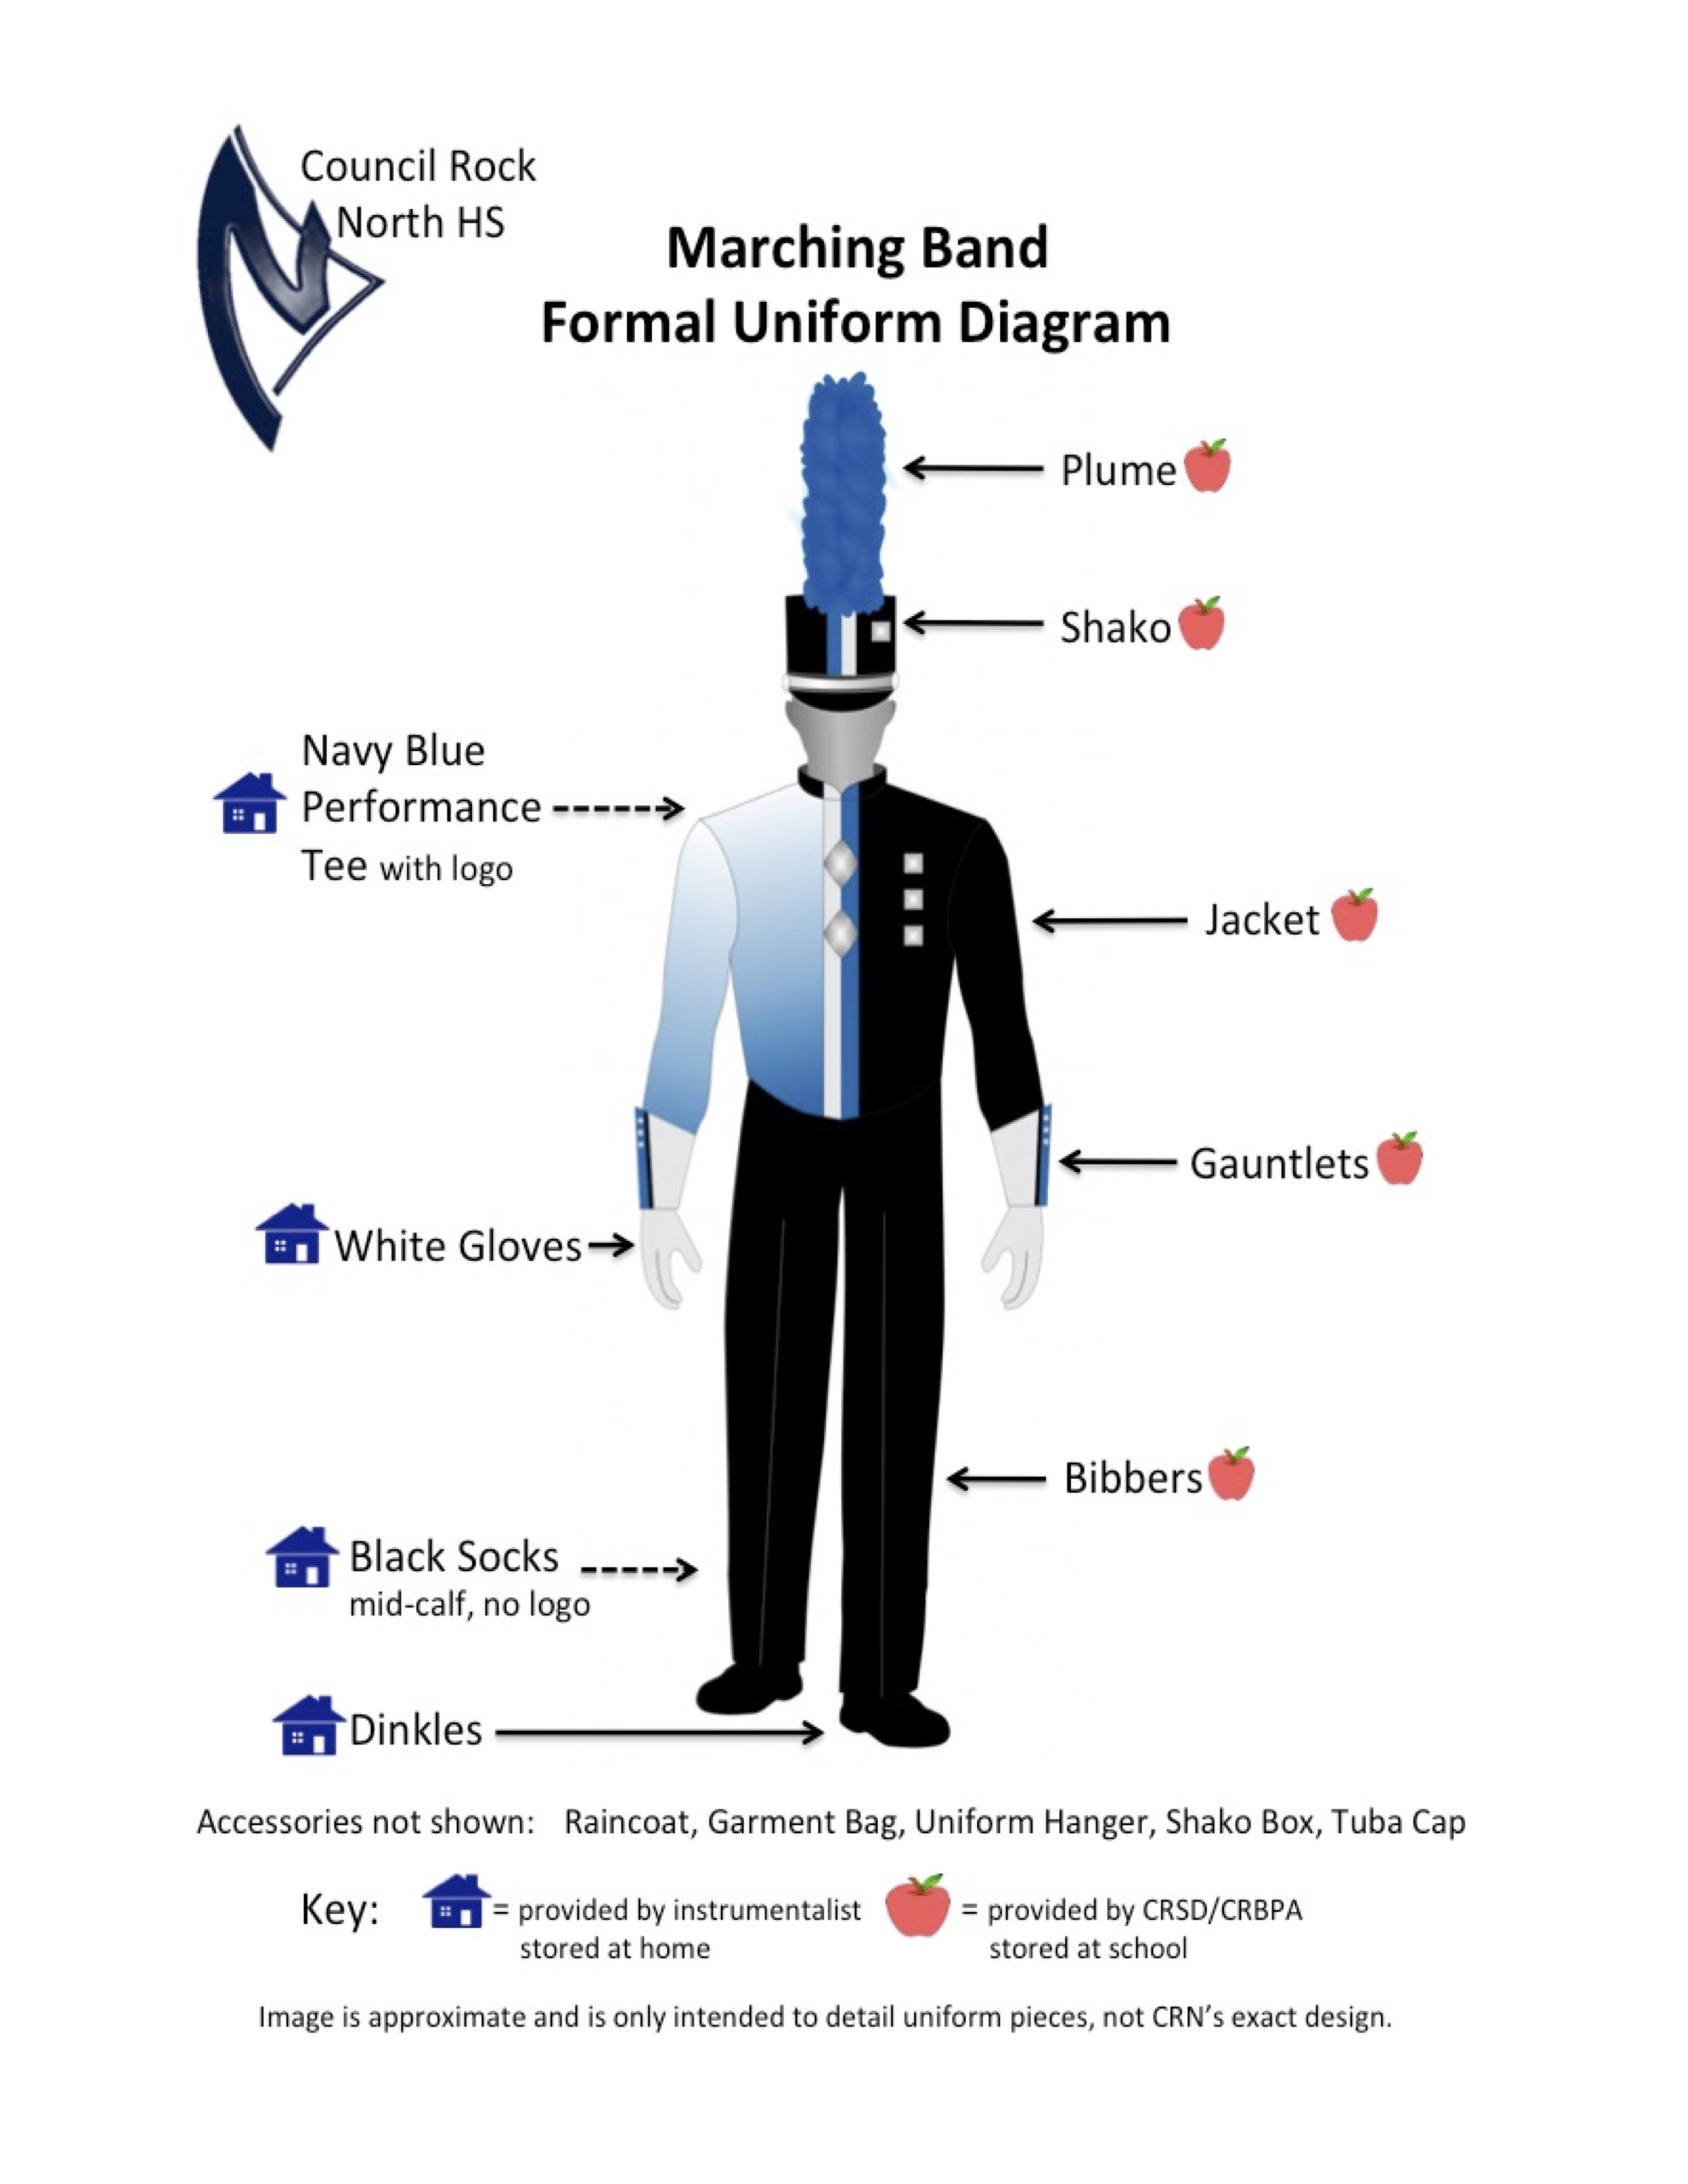 Marching Band Instrumentalist Uniform Information | Council